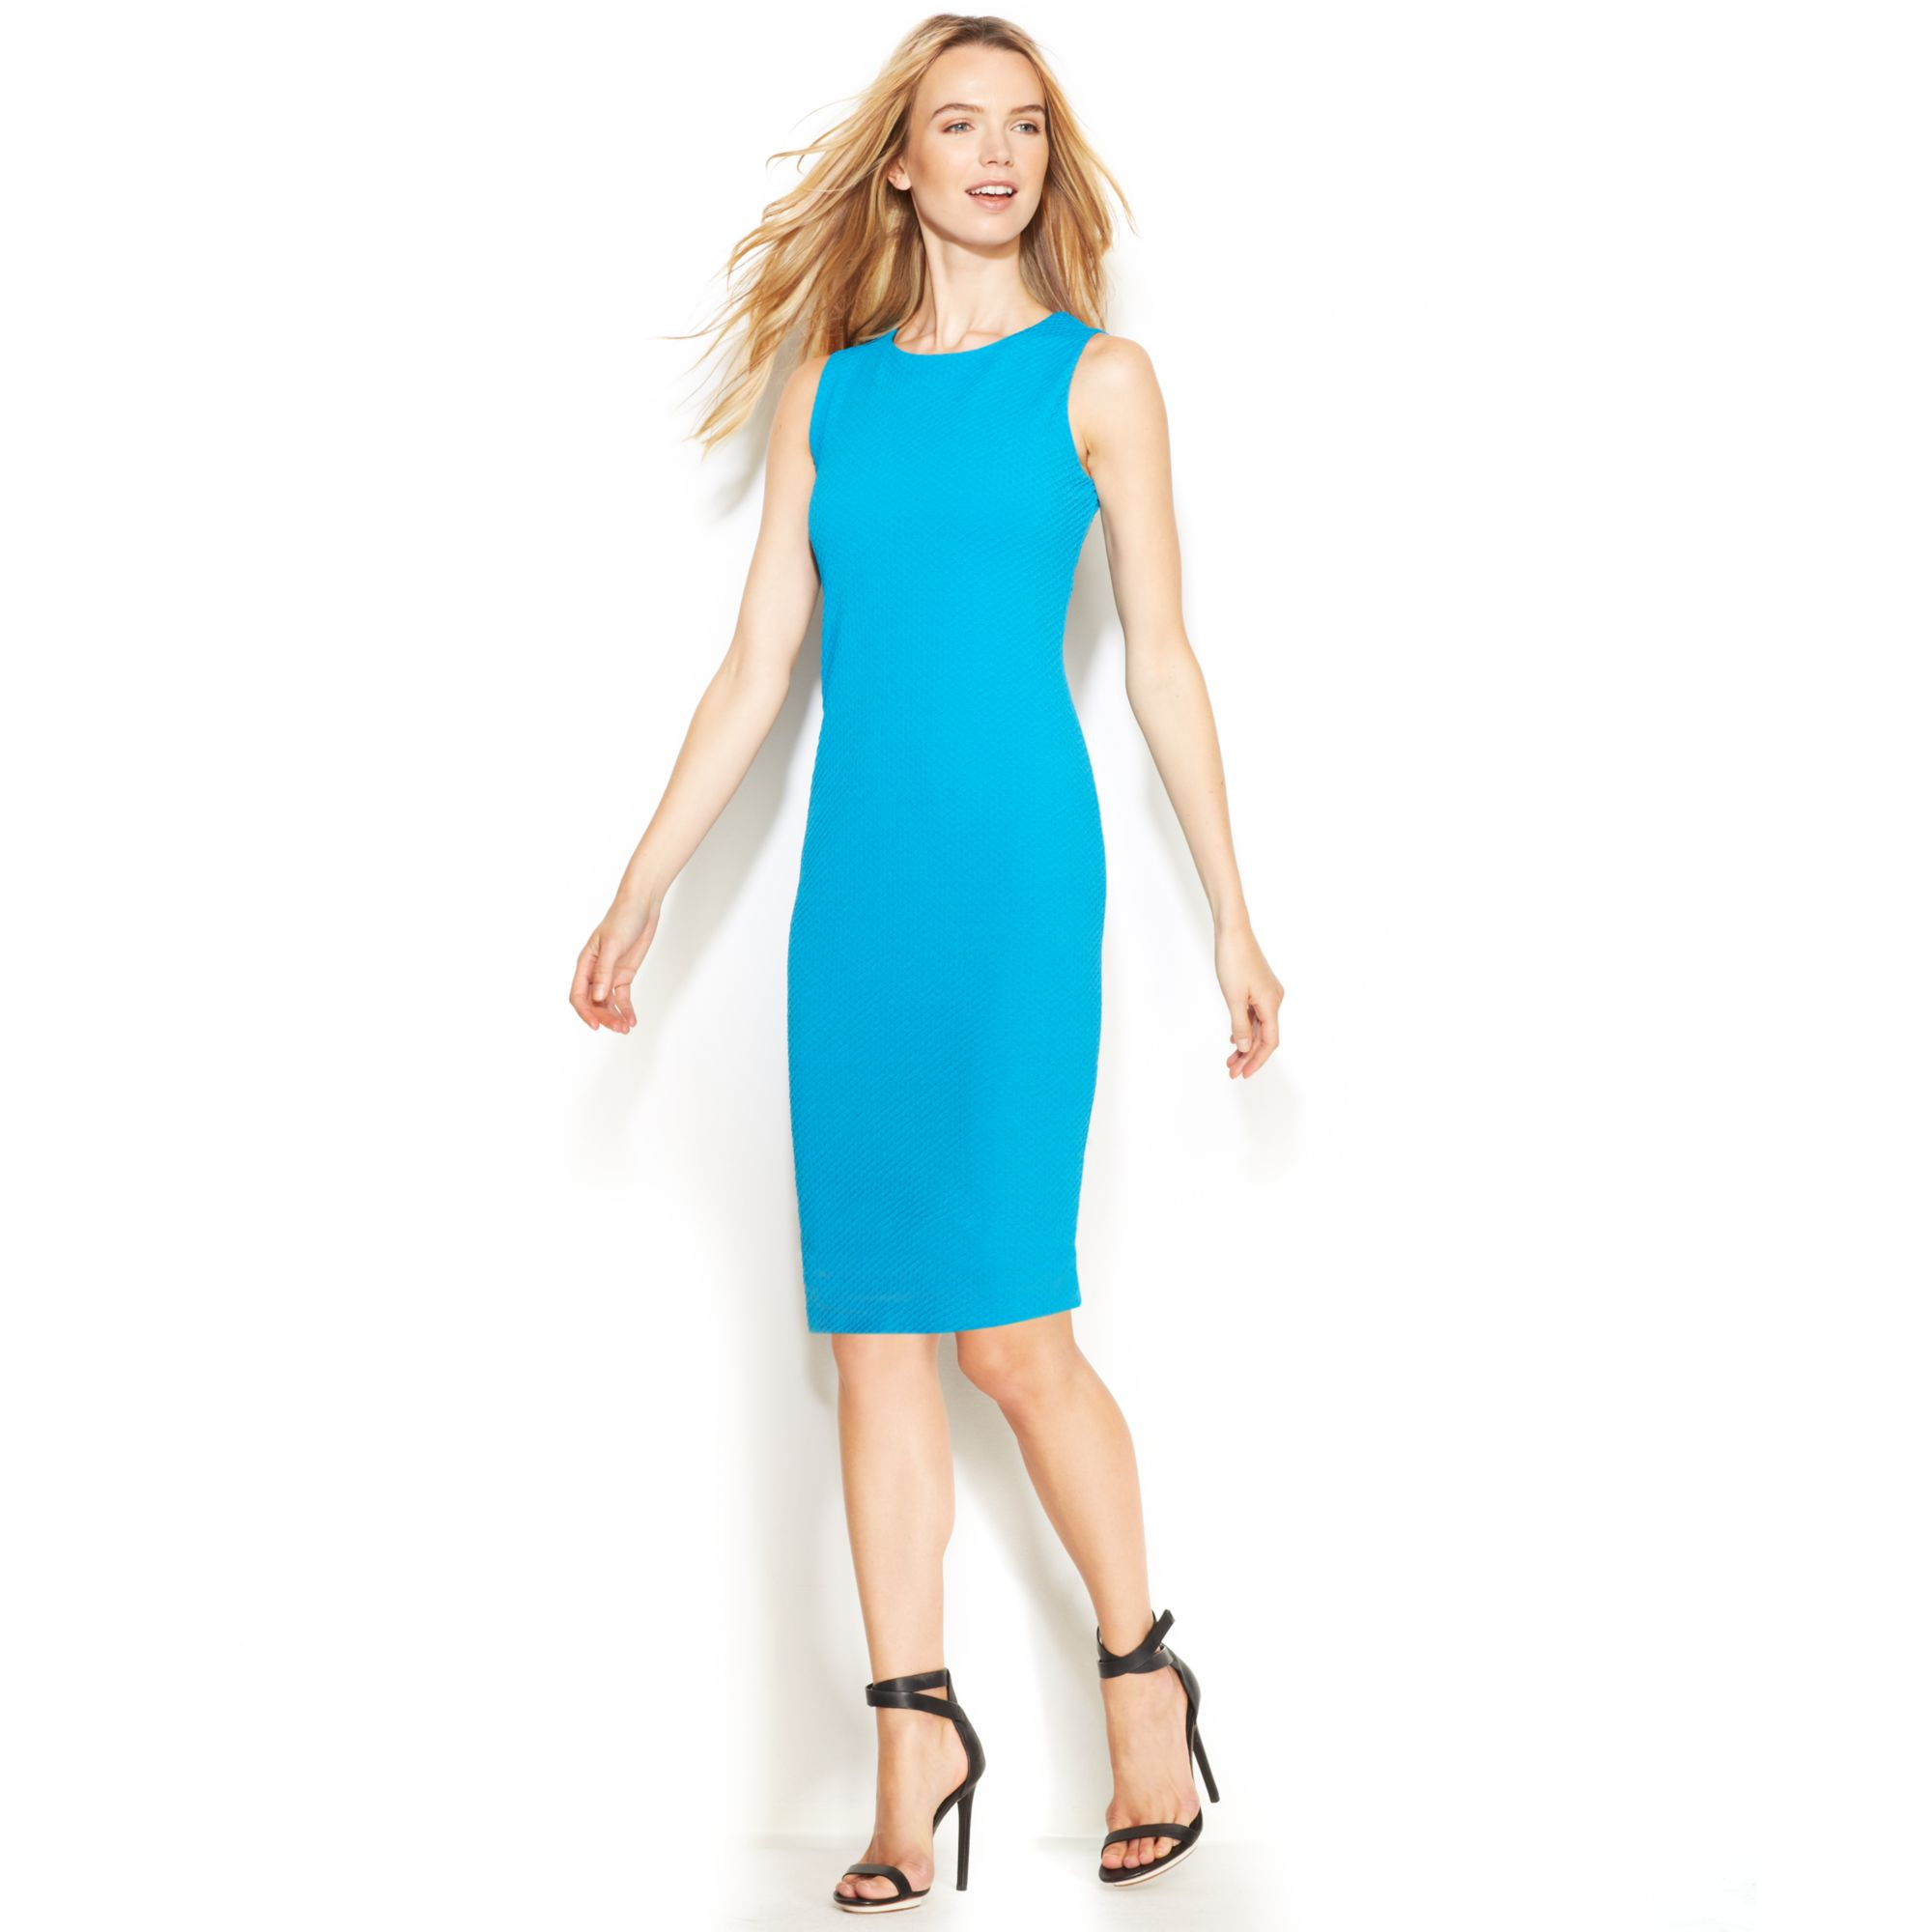 Lyst - Calvin Klein Sleeveless Textured Sheath Dress in Blue